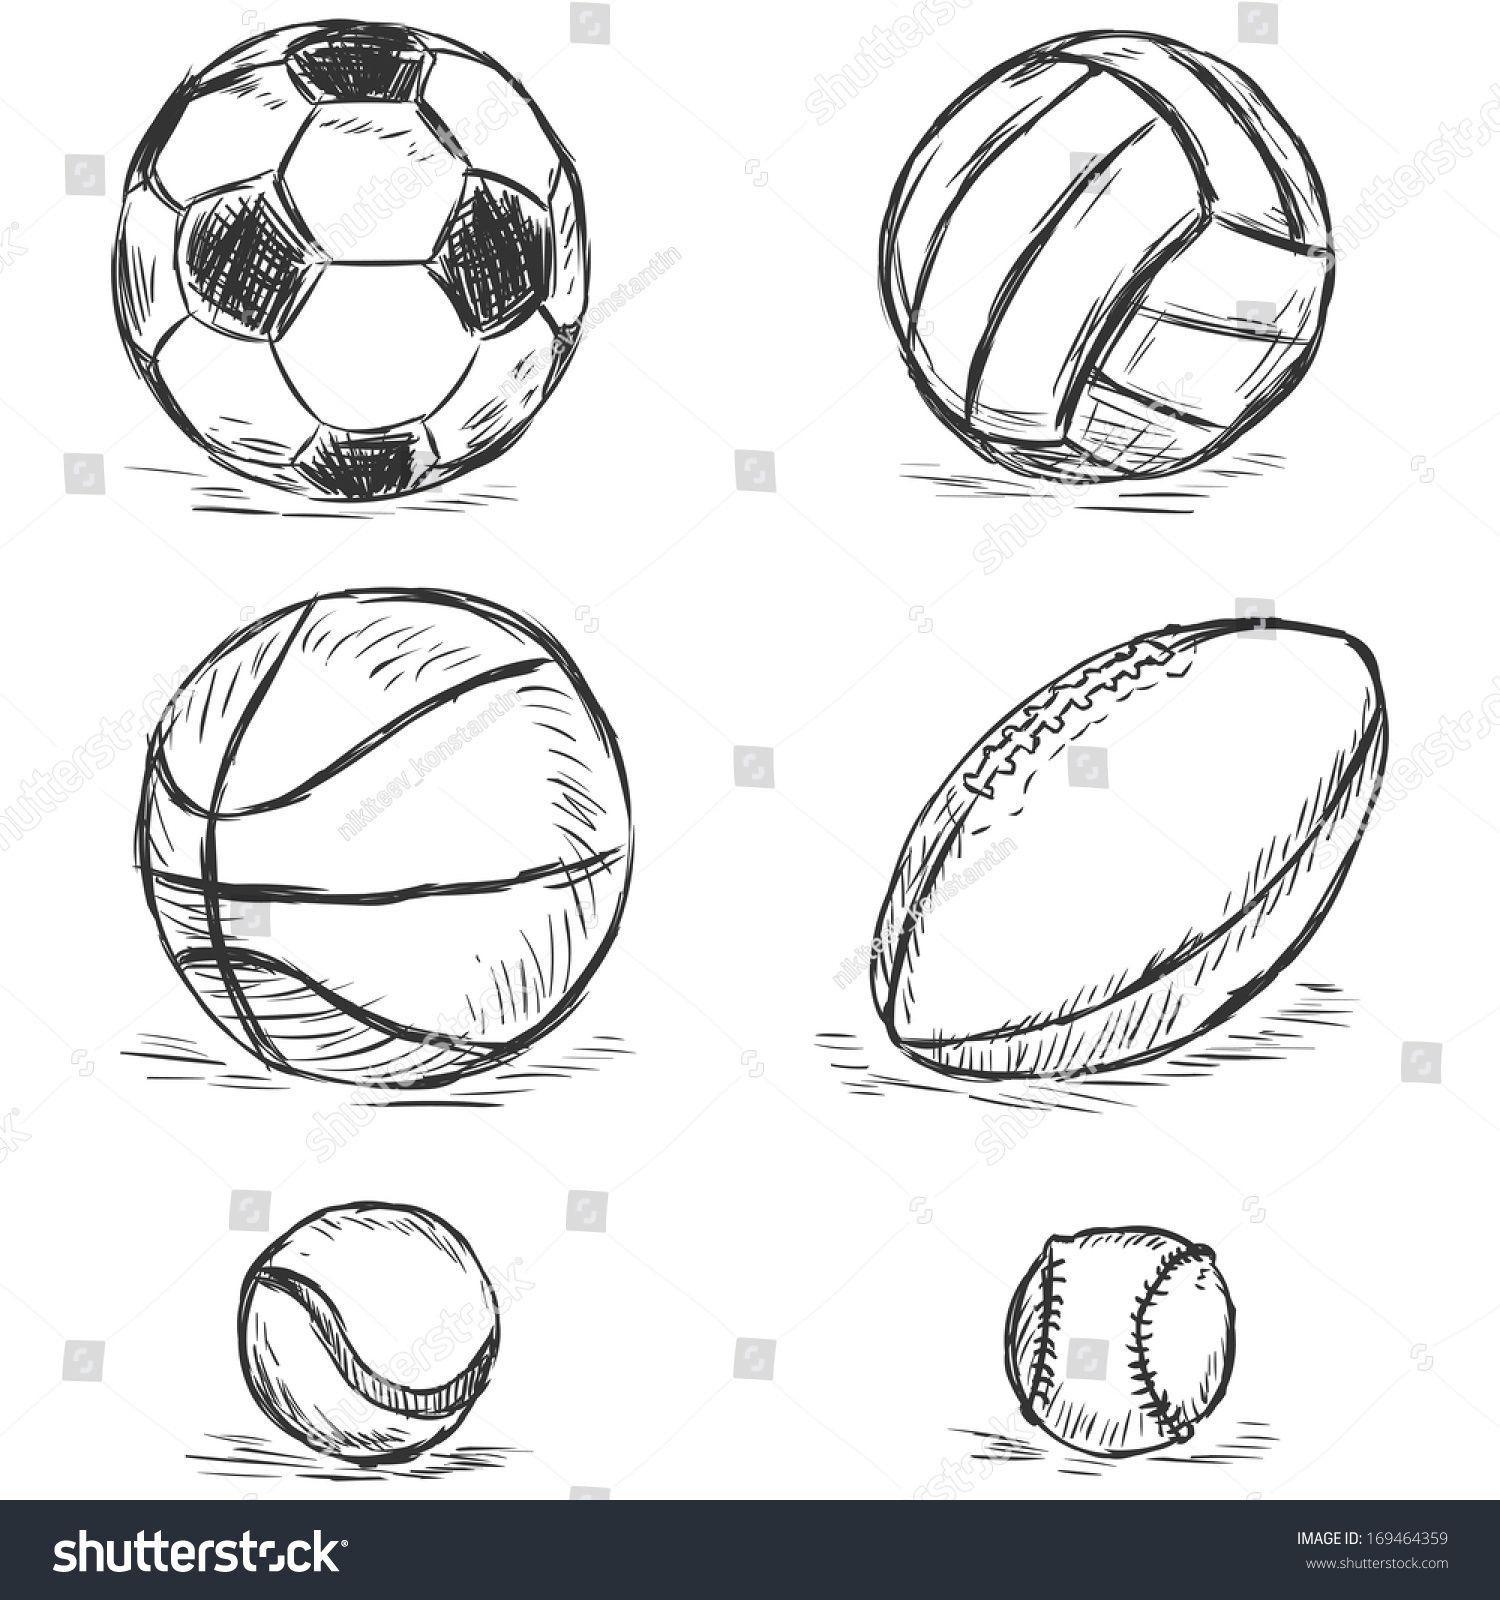 Vector Sketch Illustration Sport Balls Football Volleyball Basketball Rugby Tennis Baseball Sports Balls Sports Drawings Sport Illustration